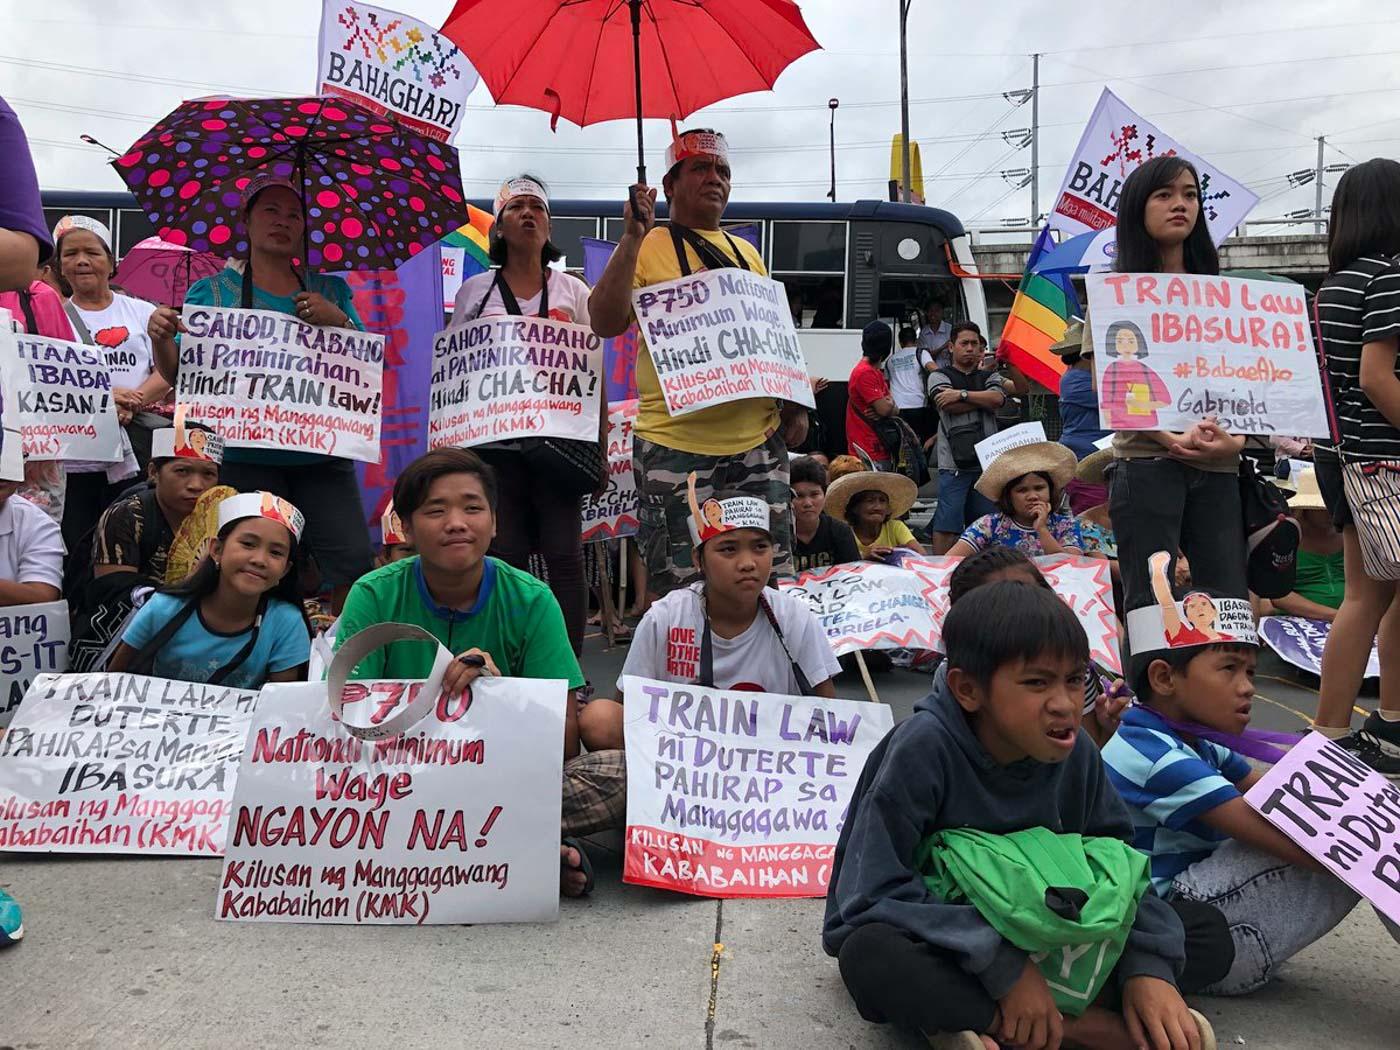 FILIPINO WOMEN. Members of the #BabaeAko movement join the United People's SONA on Monday, July 23, 2018. Photo by Samantha Bagayas/Rappler